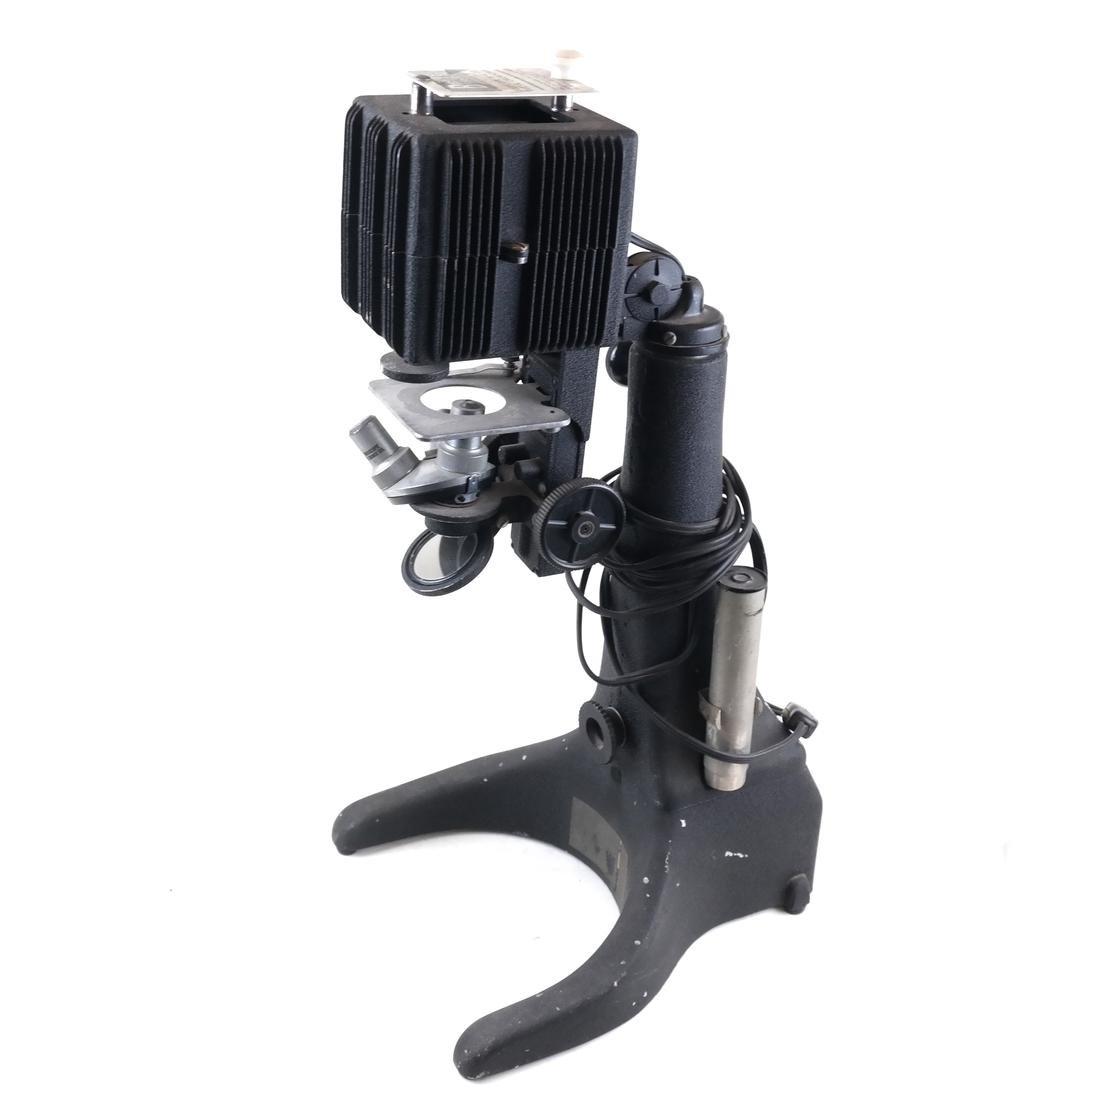 Bioscope Projecting Microscope